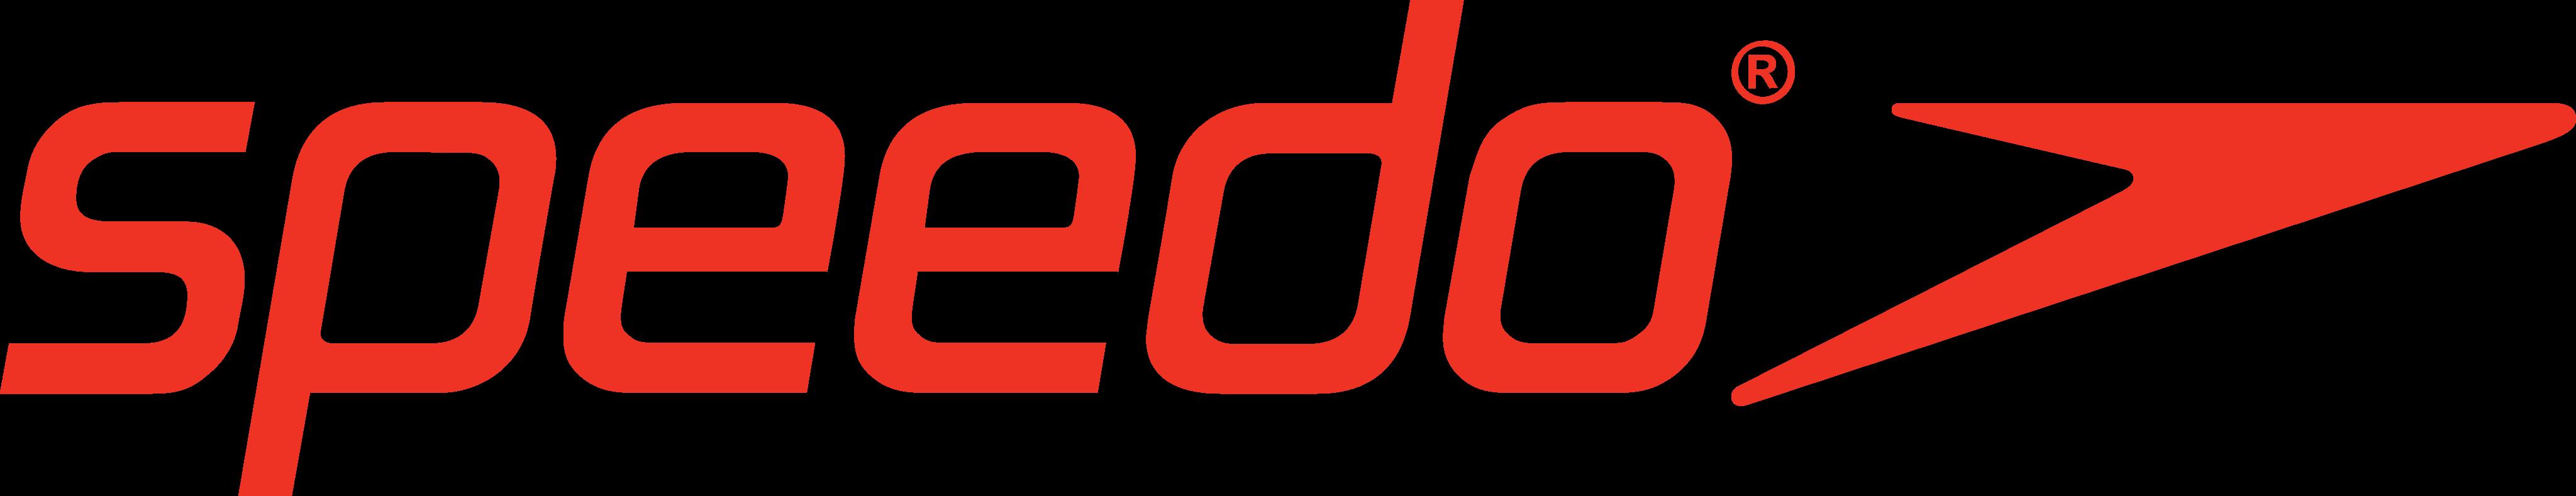 speedo logo 8 - Speedo Logo